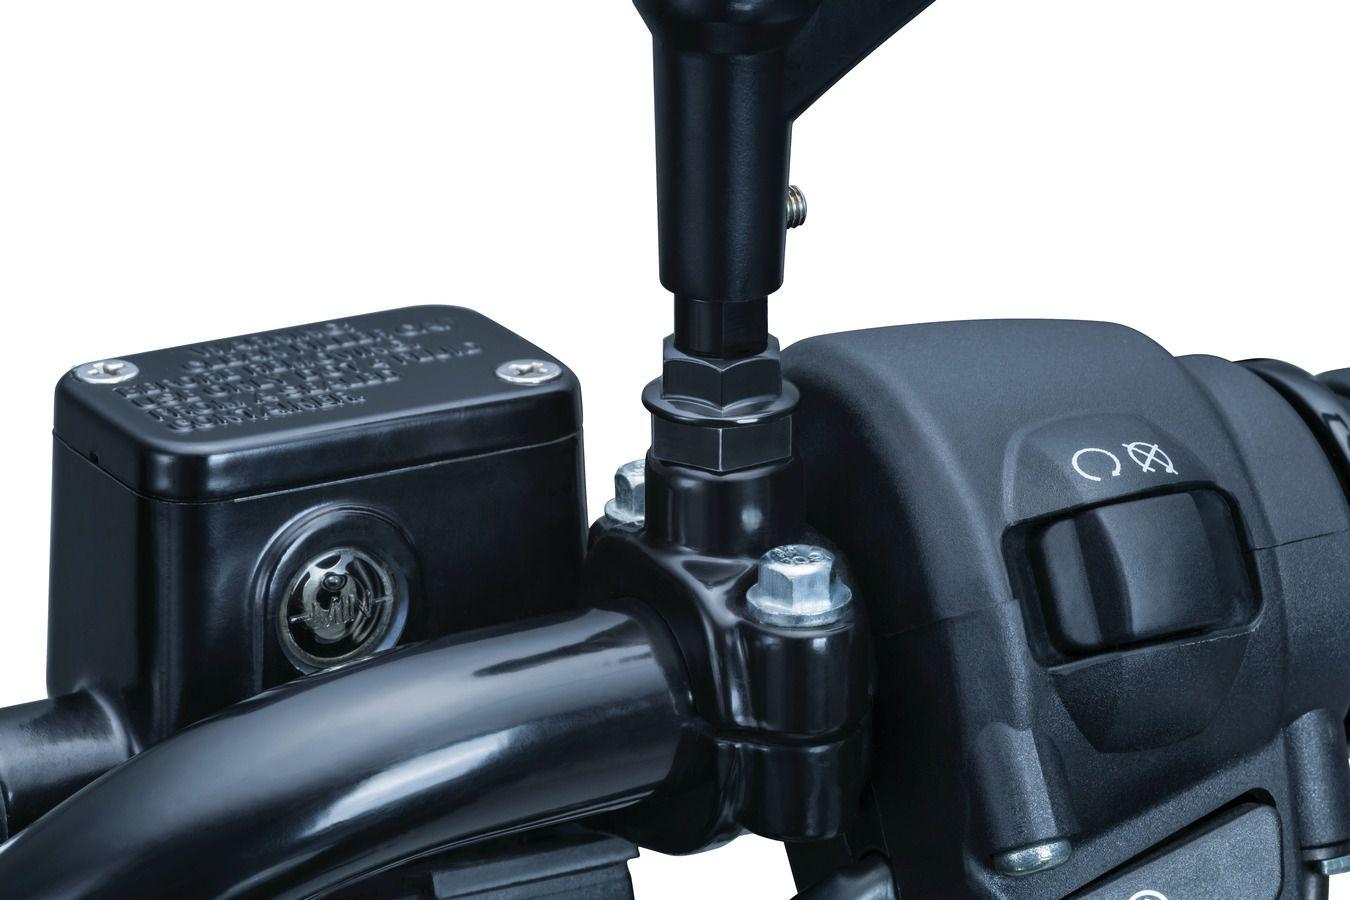 Adaptador Cromado para Retrovisores Modelos Kuryakyn das Motocicletas Triumph